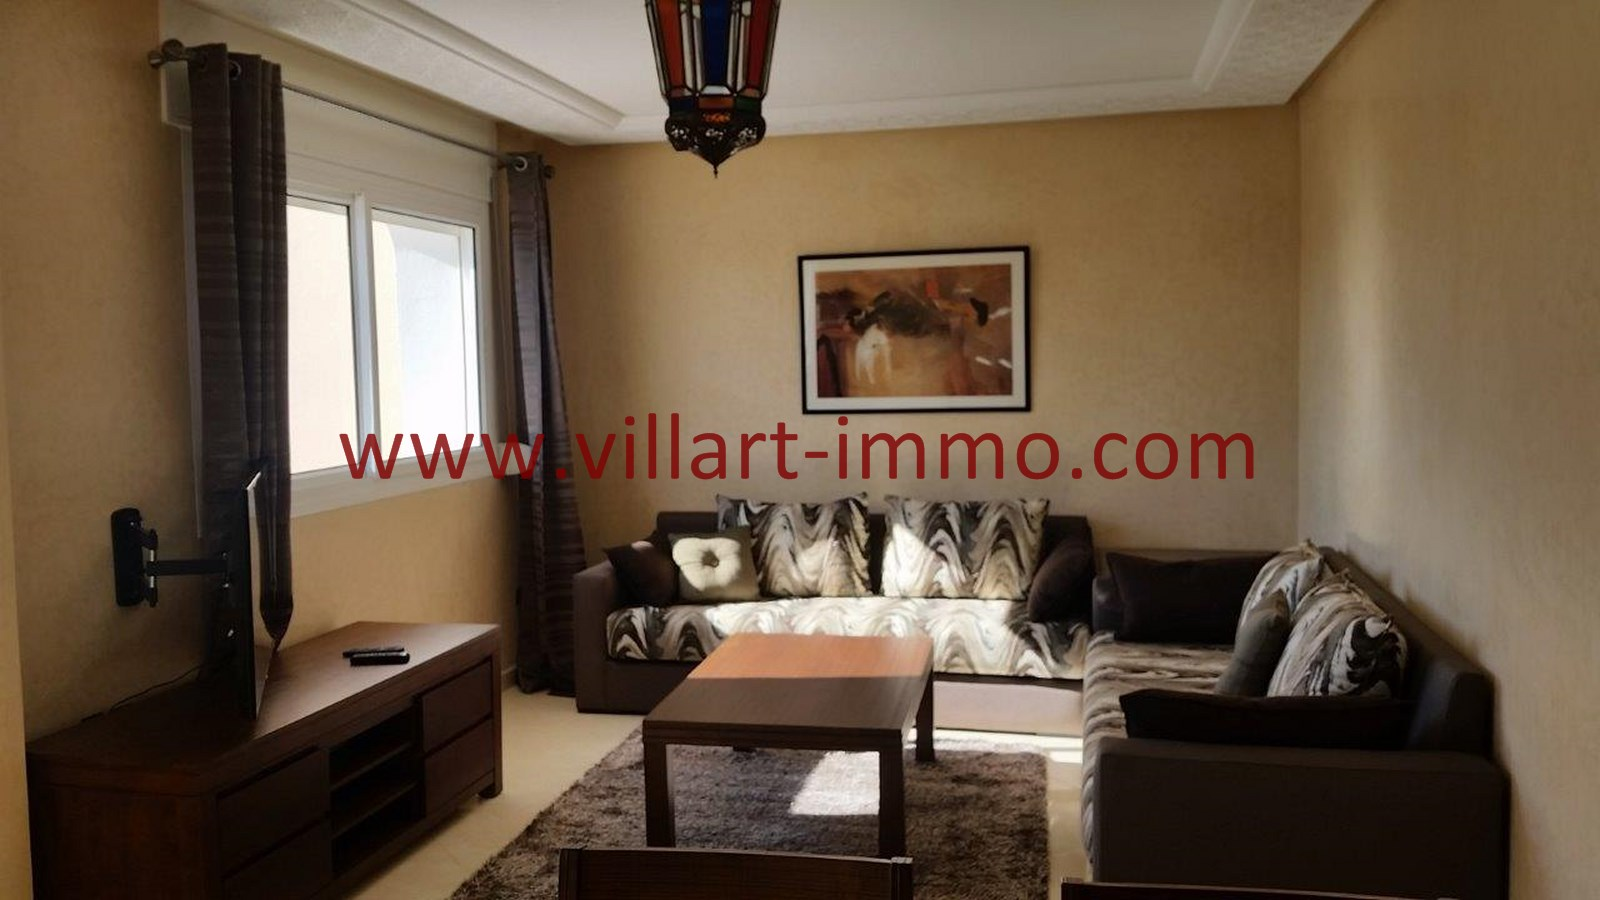 location appartement meubl tanger avec terrasse zone achakar villart. Black Bedroom Furniture Sets. Home Design Ideas